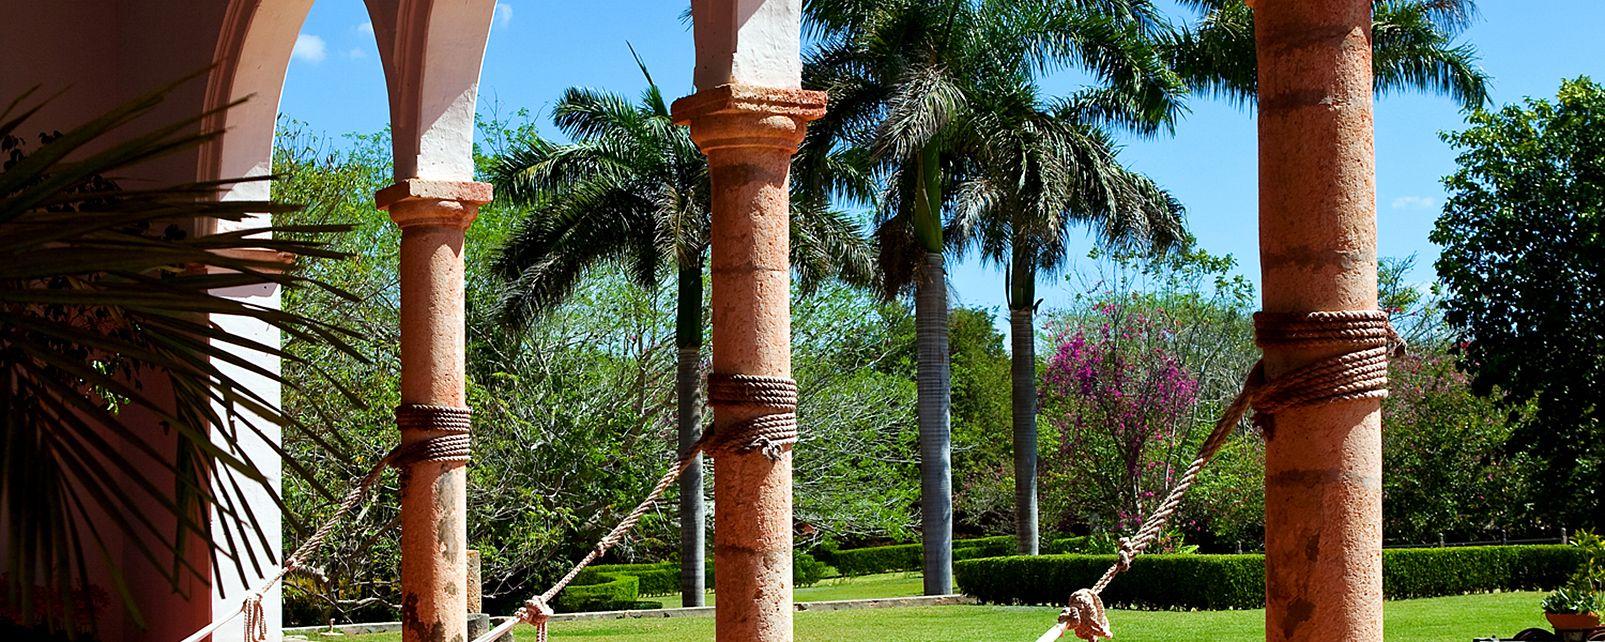 Hôtel Hacienda Temozon